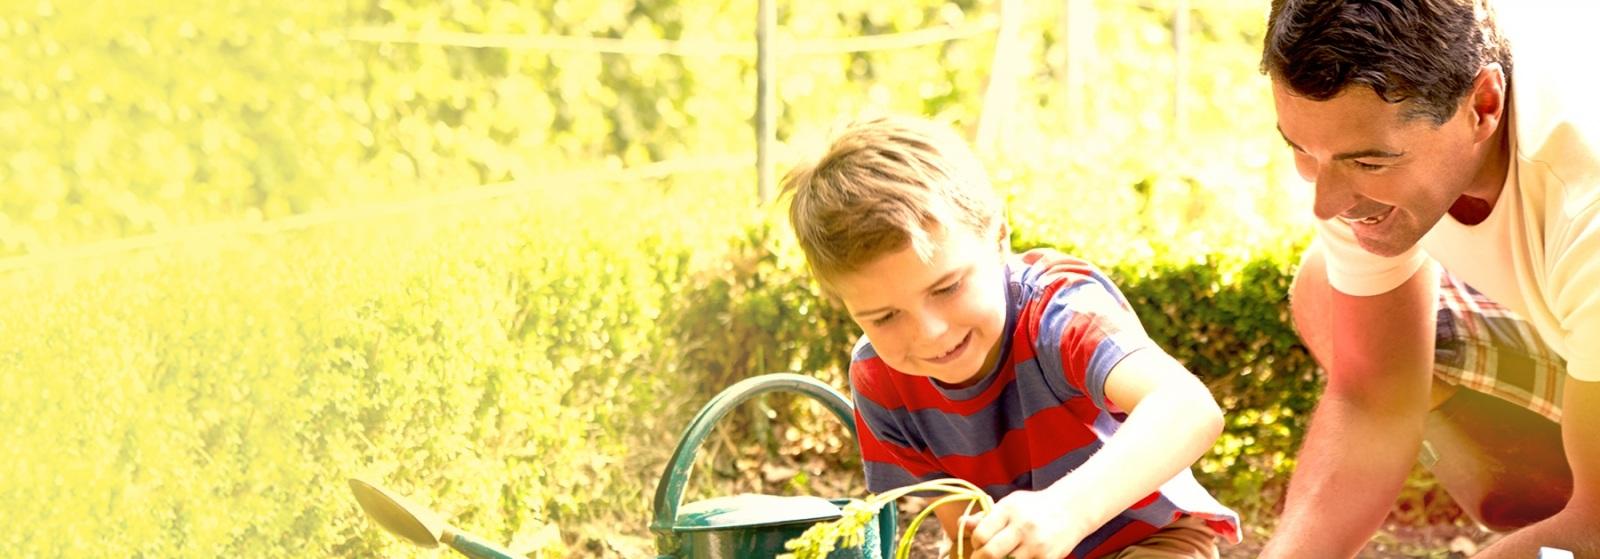 Boy in a garden harvesting carrots